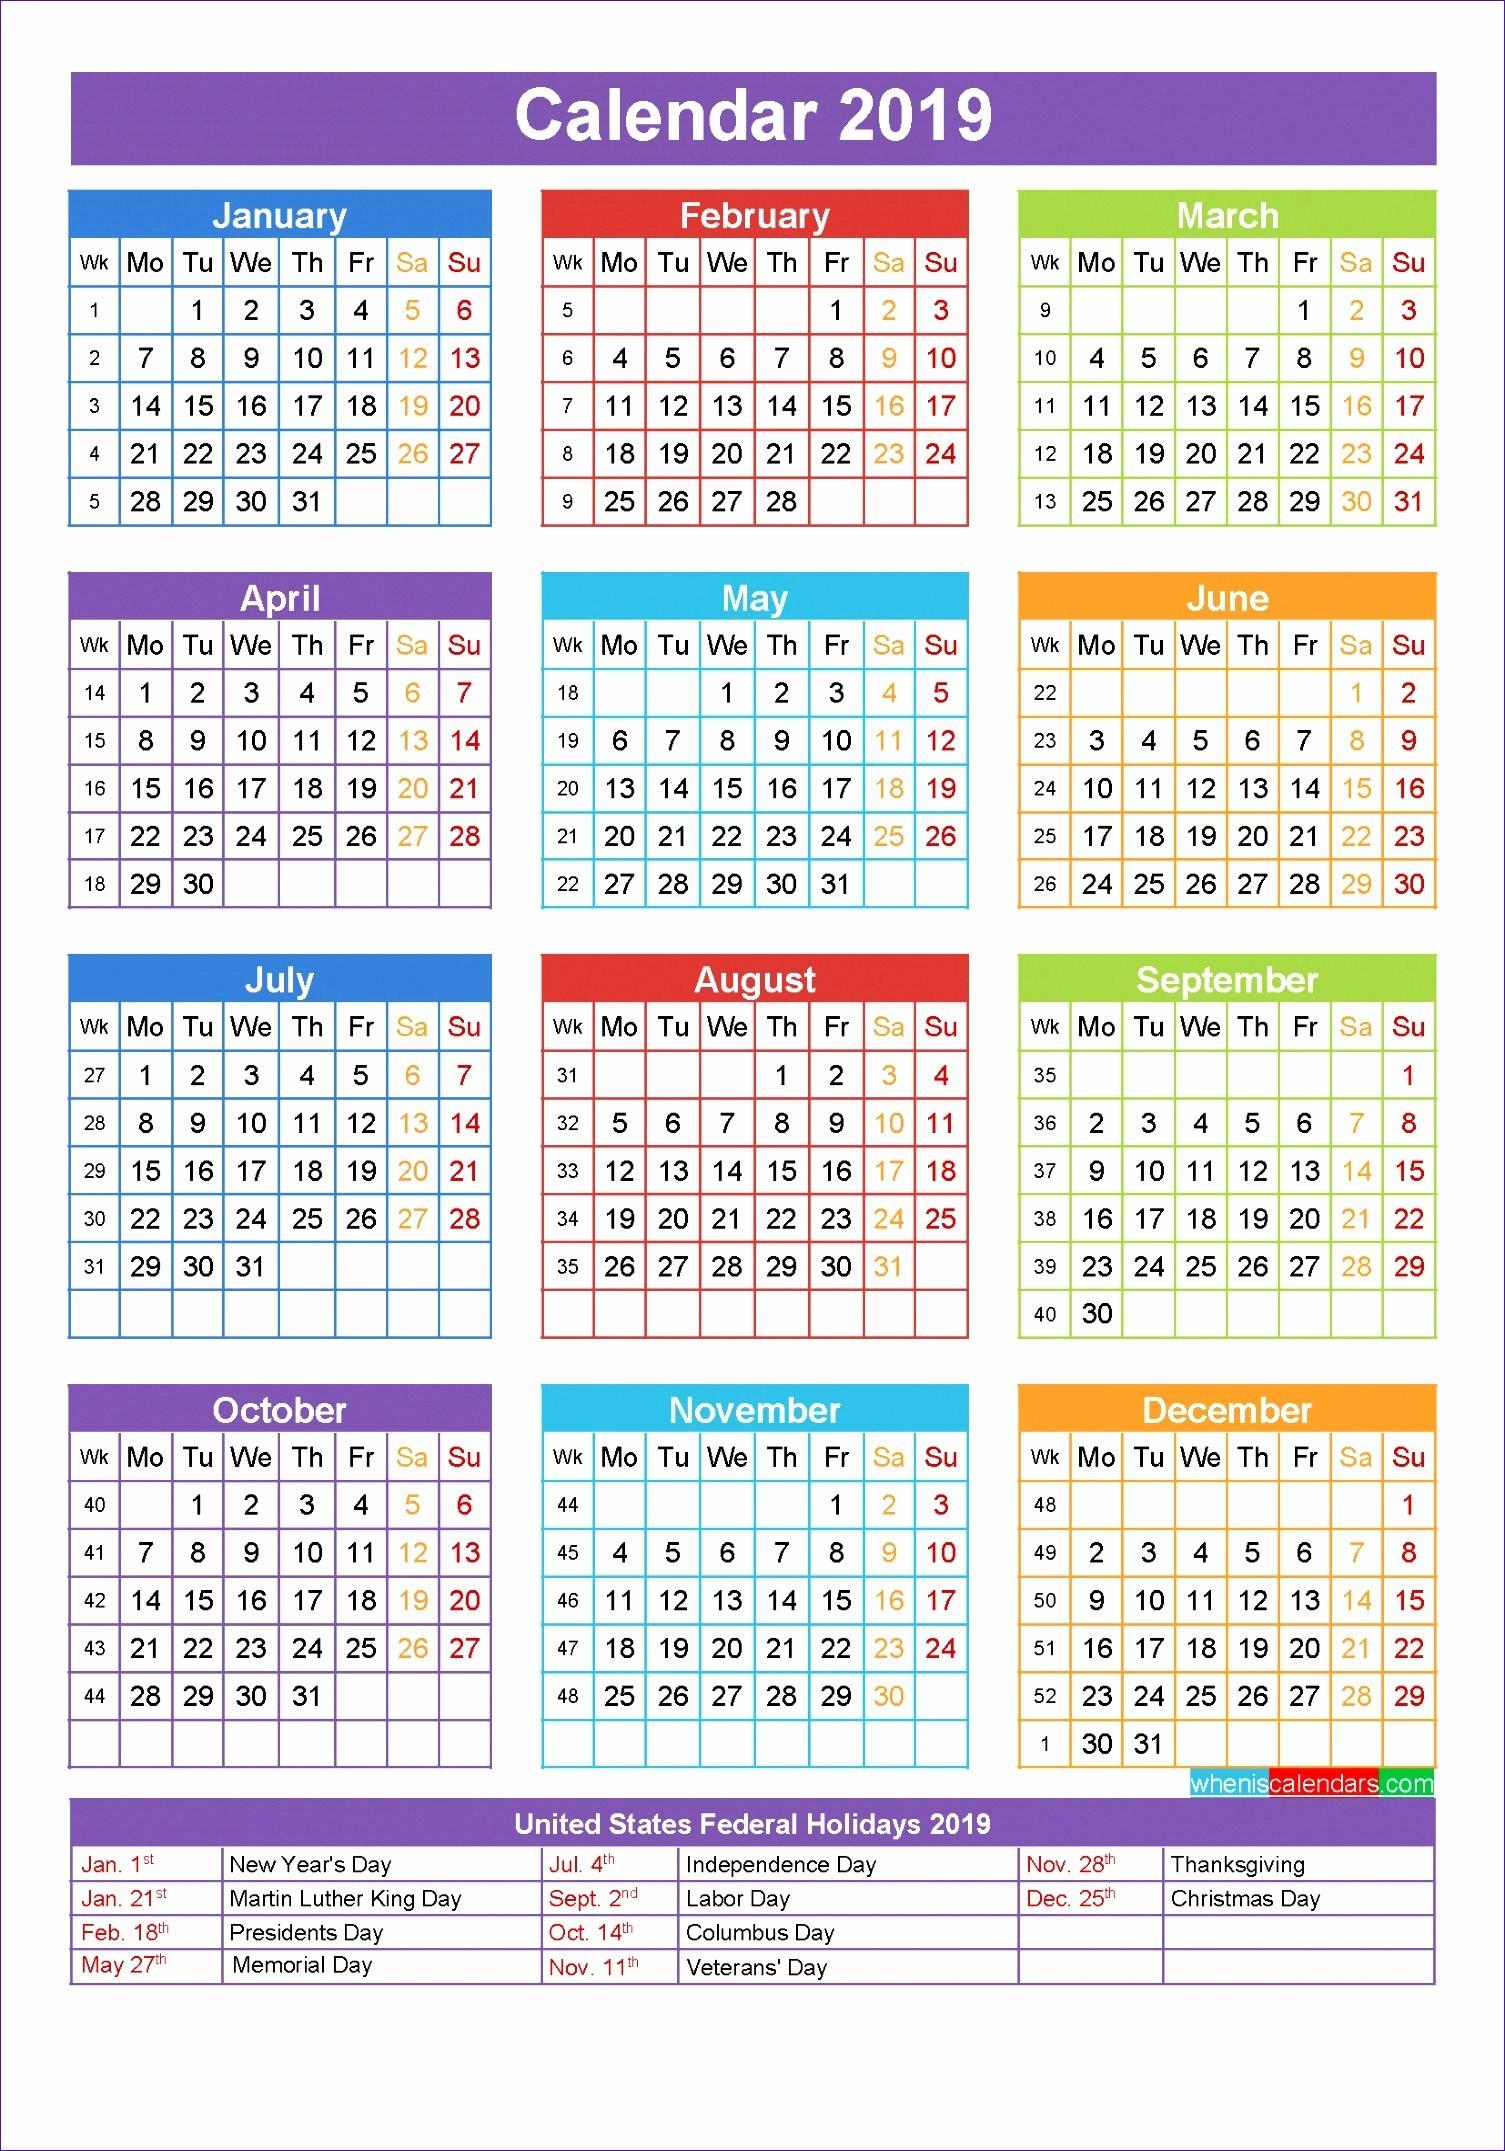 March 2019 Calendar Sri Lanka Más Recientemente Liberado 2019 Excel Calendar Template with Holidays Of March 2019 Calendar Sri Lanka Más Arriba-a-fecha events City Nomads